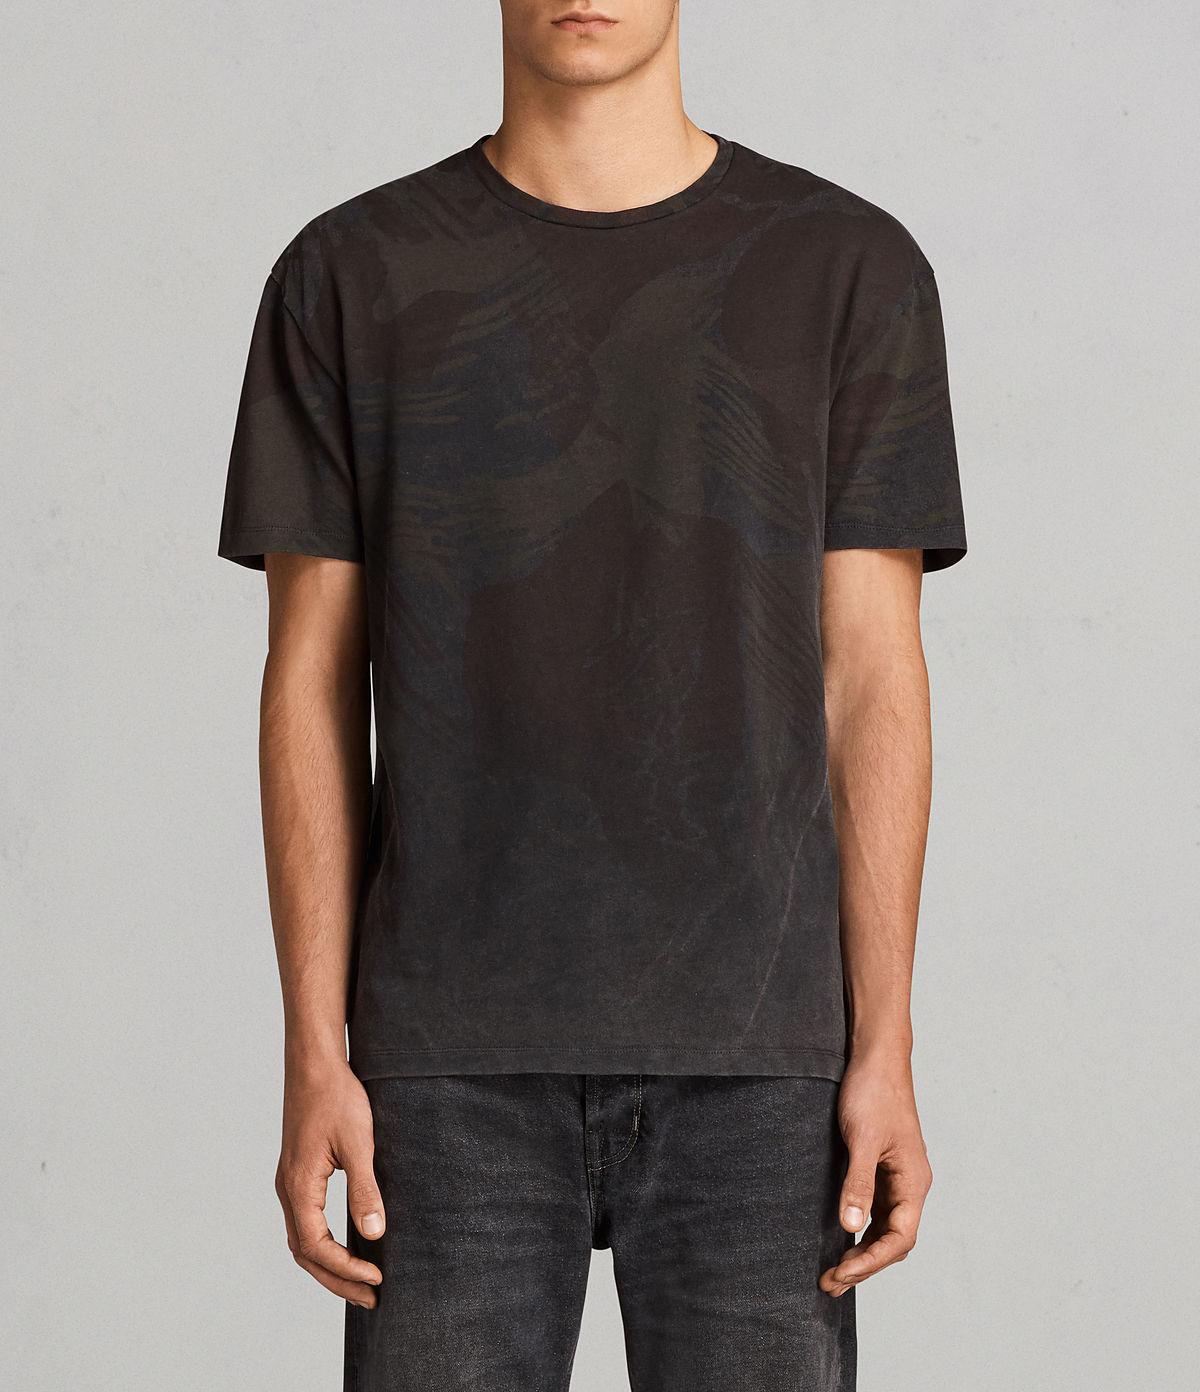 contour-crew-t-shirt